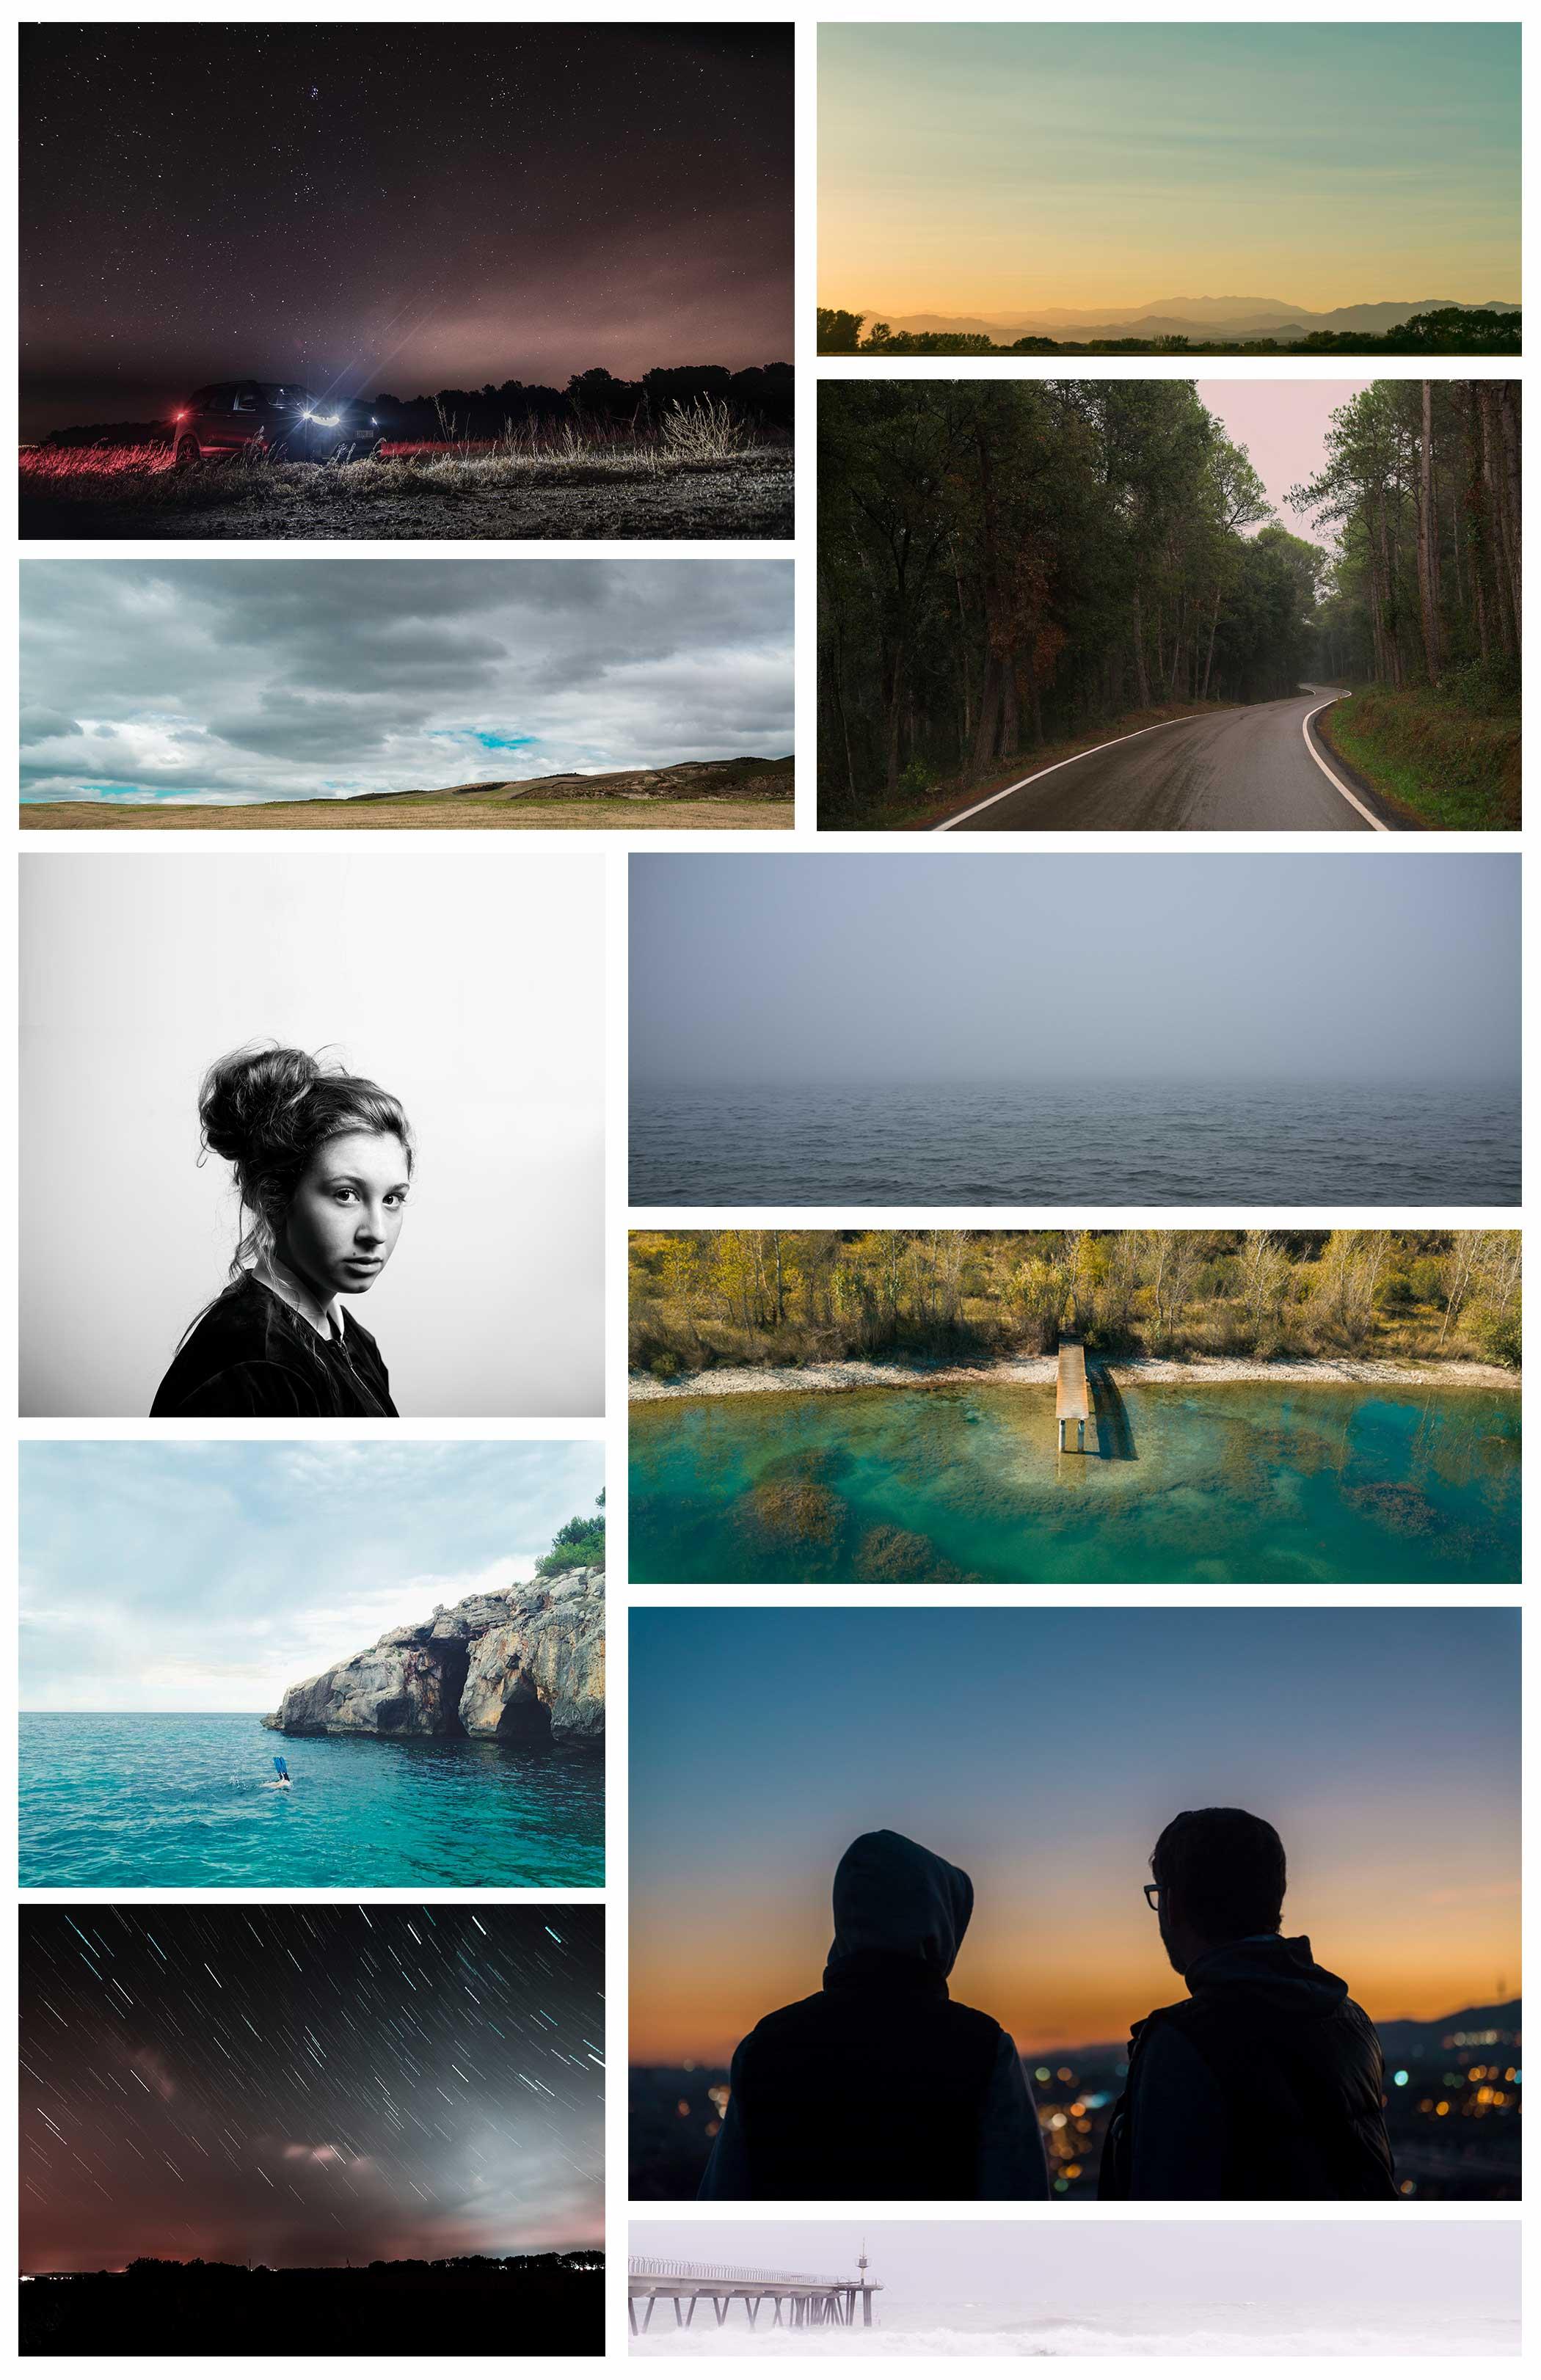 nineteenpixels photographers and video makers